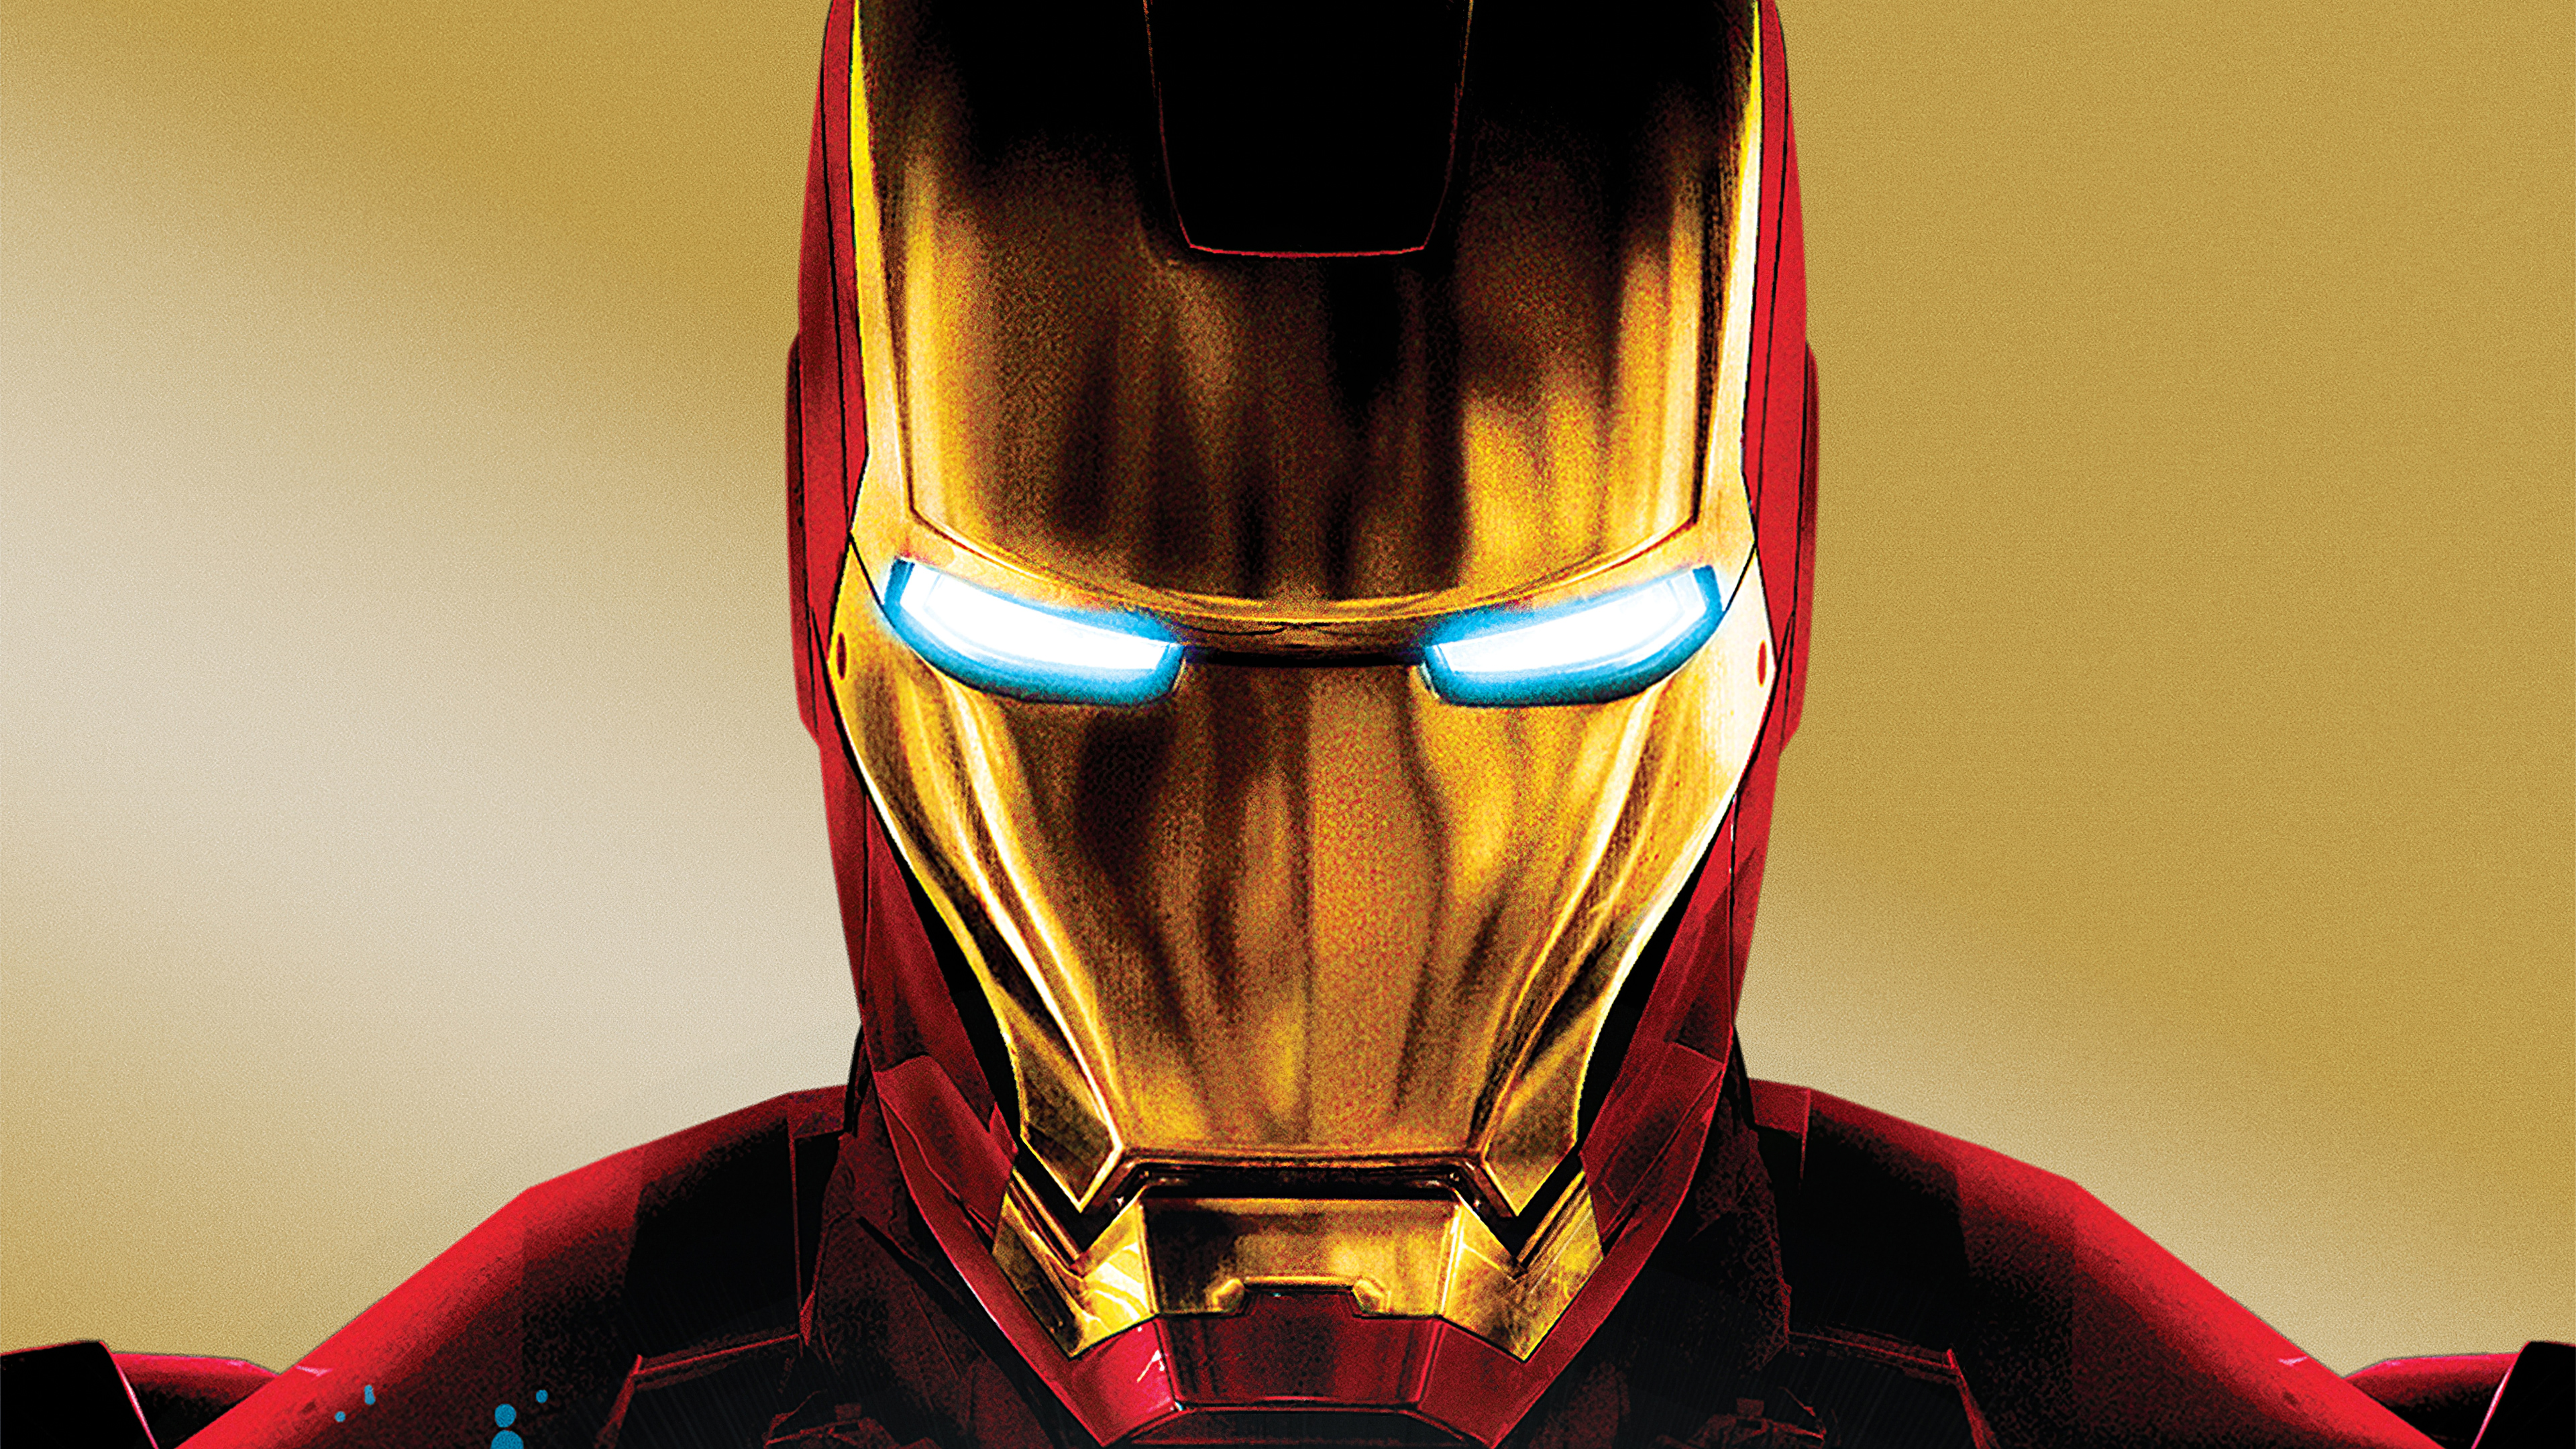 iron man mask art 1576091854 - Iron Man Mask Art - iron man wallpaper phone 4k, iron man wallpaper 4k, iron man 4k wallpaper